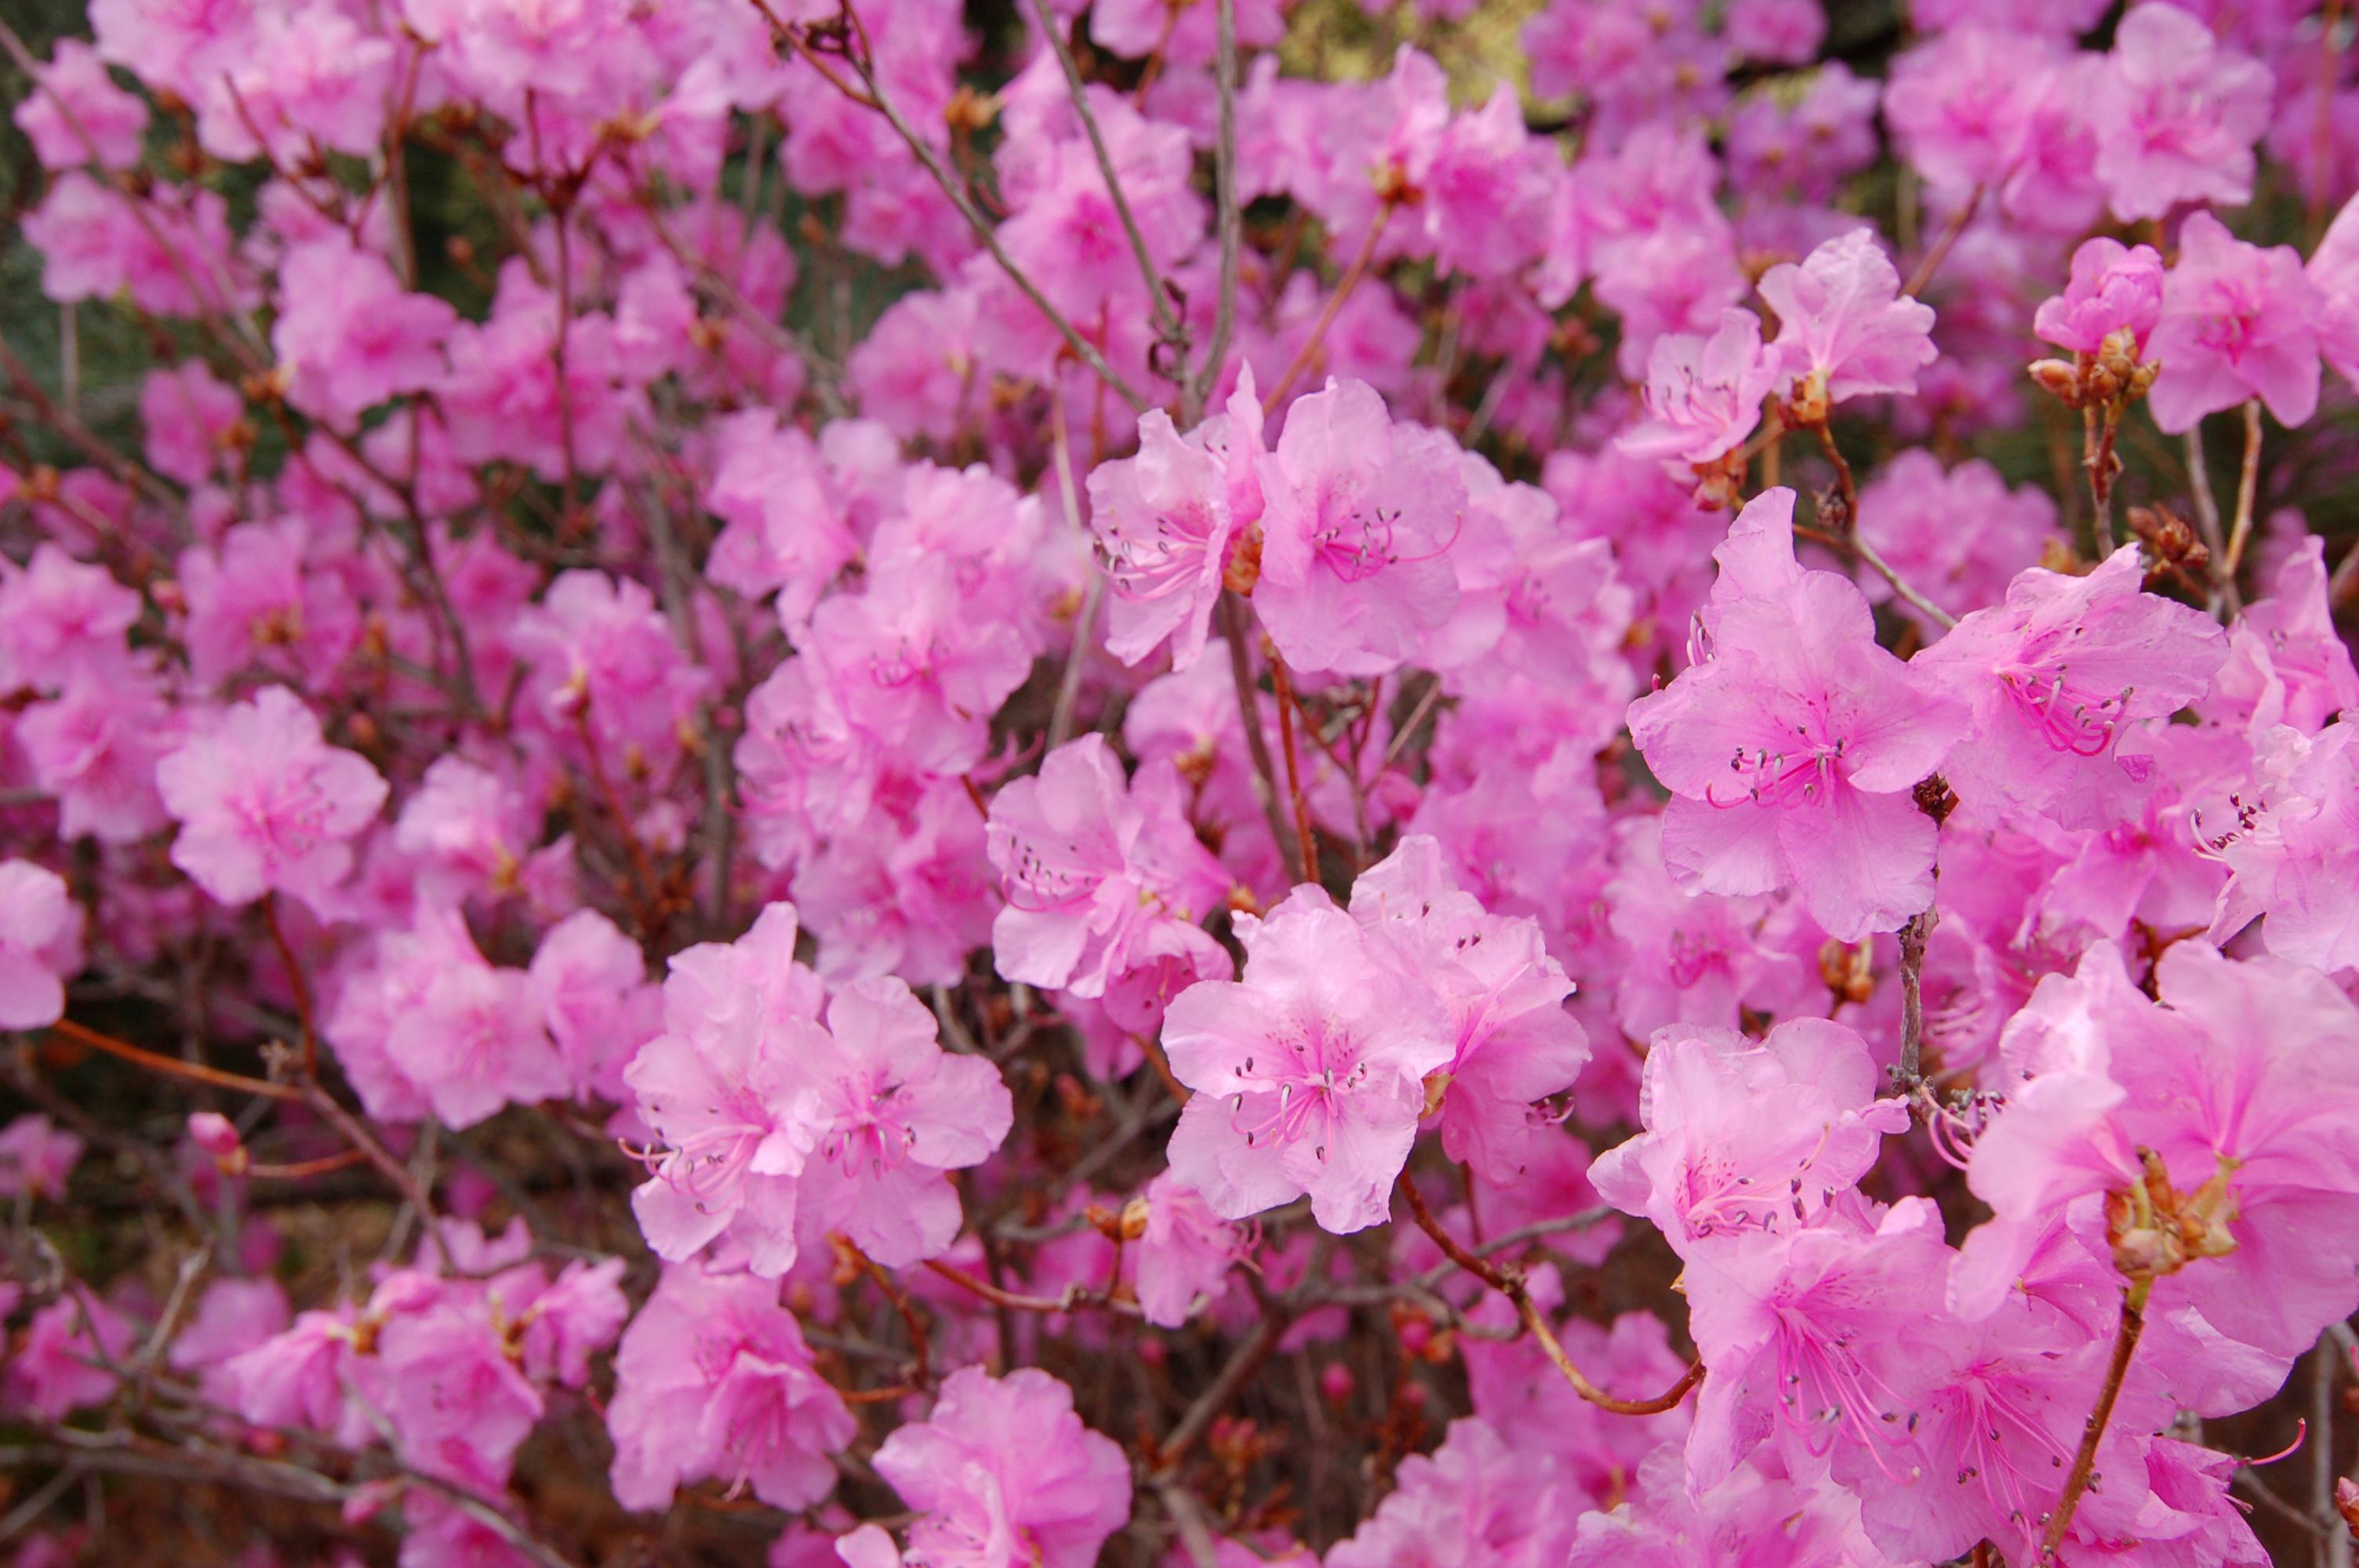 Korean_Rhododendron_Rhododendron_mucronulatum_'Wheeldon_Pink'_Flowers